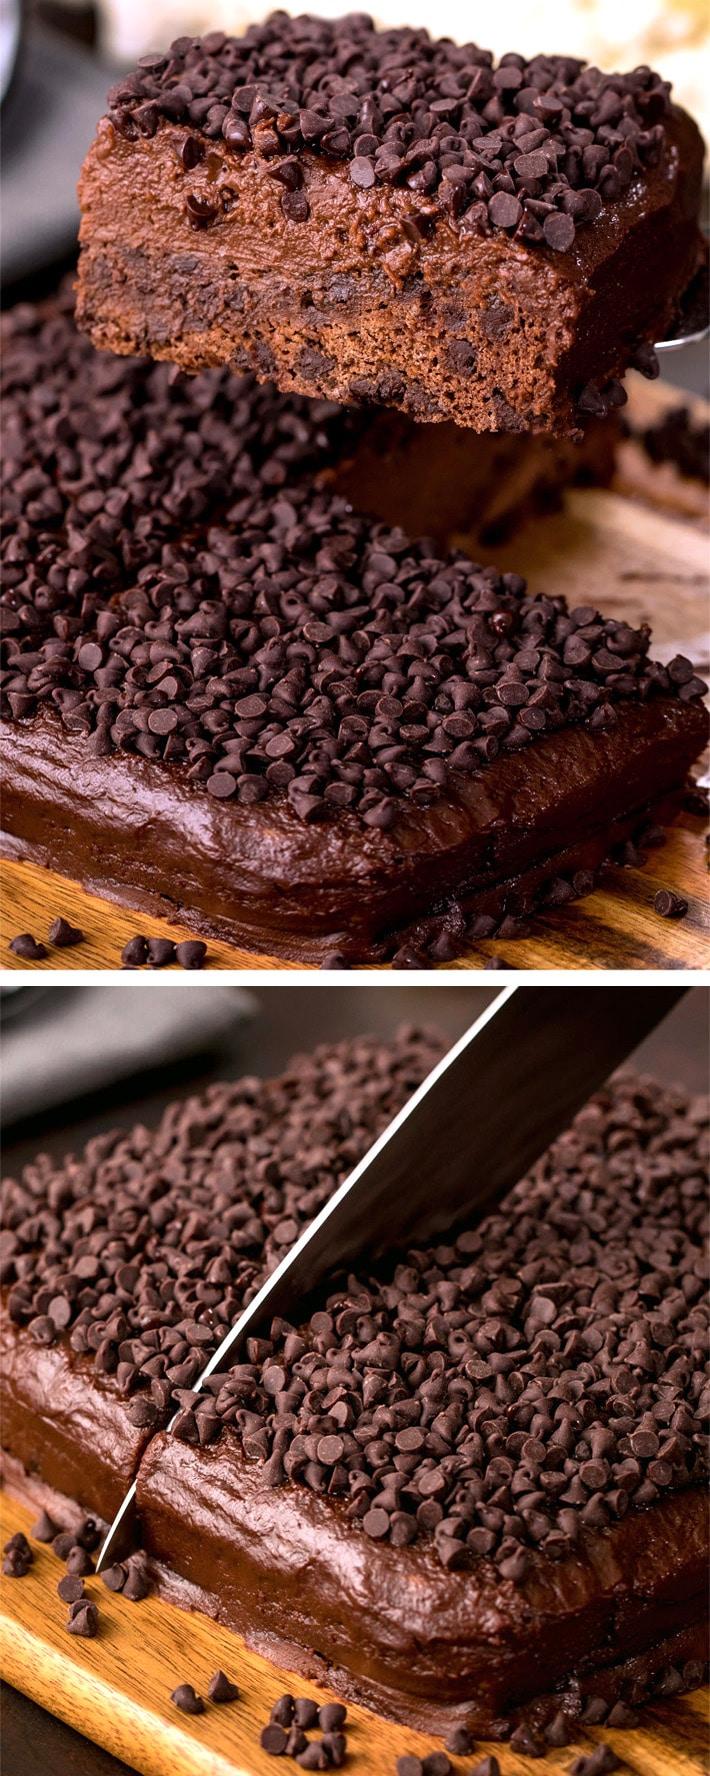 Secretly Healthy Chocolate Cake Recipe (Vegan, Made With Cauliflower)